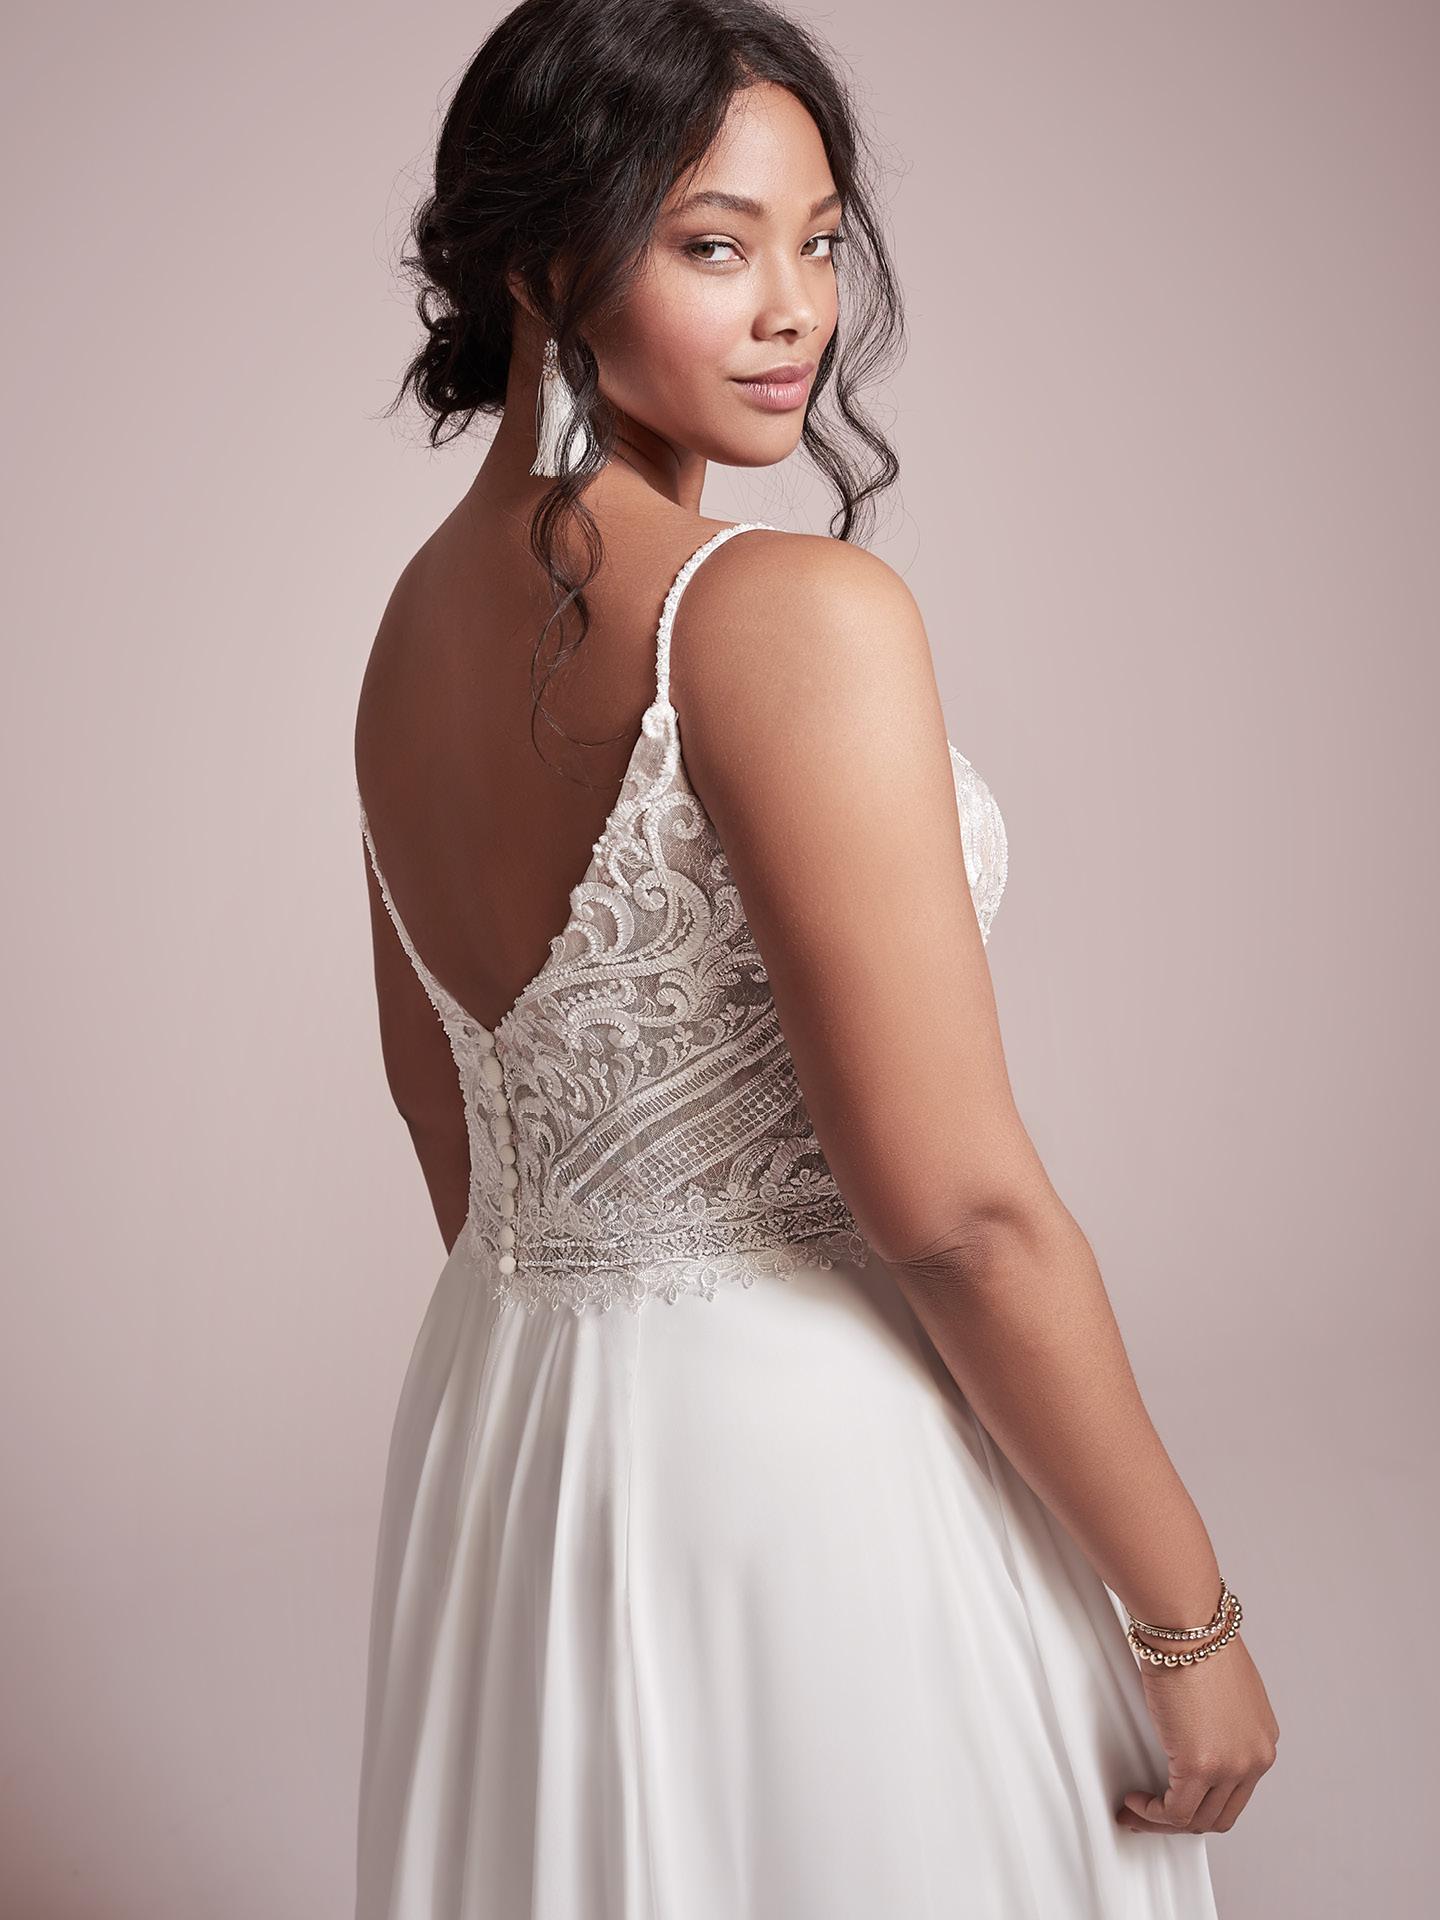 Plus Size Model Wearing Affordable Beach Wedding Dress Called Lorraine by Rebecca Ingram